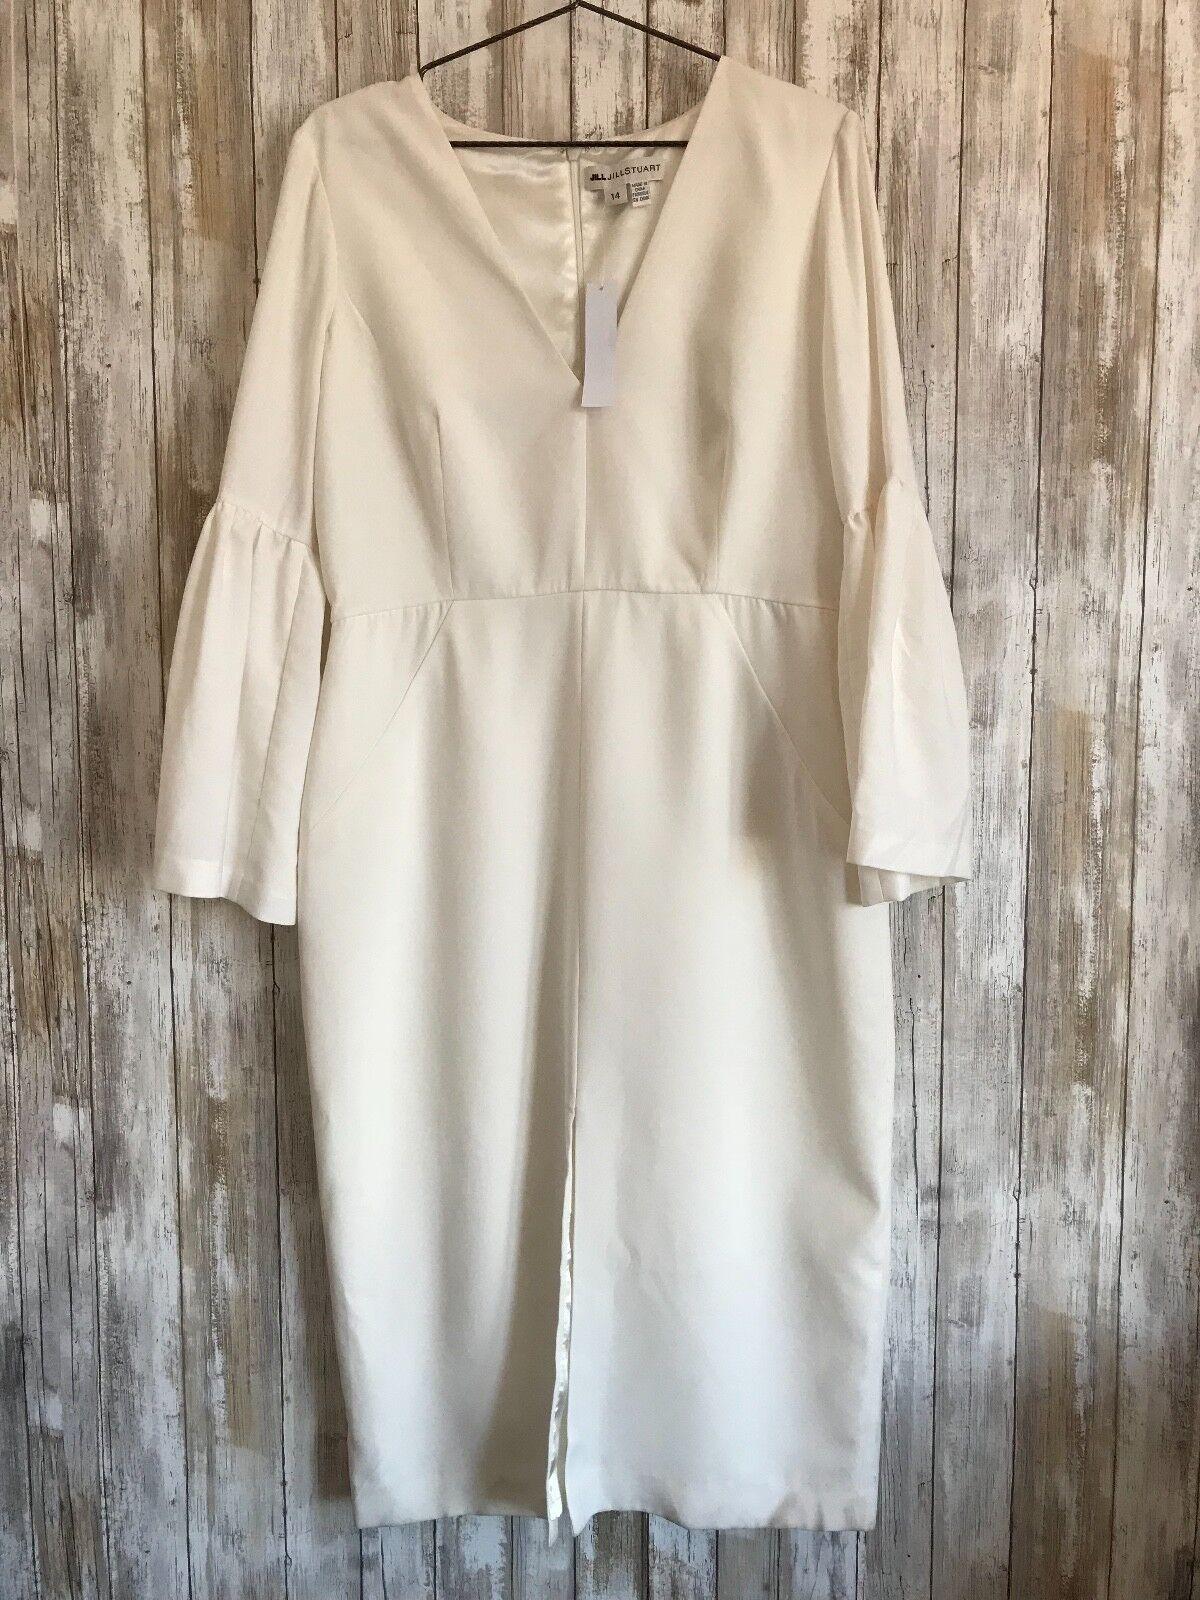 6dc941fba8a Anthropologie JILL Jill Stuart Ivory Off Midi Bell Sleeve Dress Plus 14 NEW